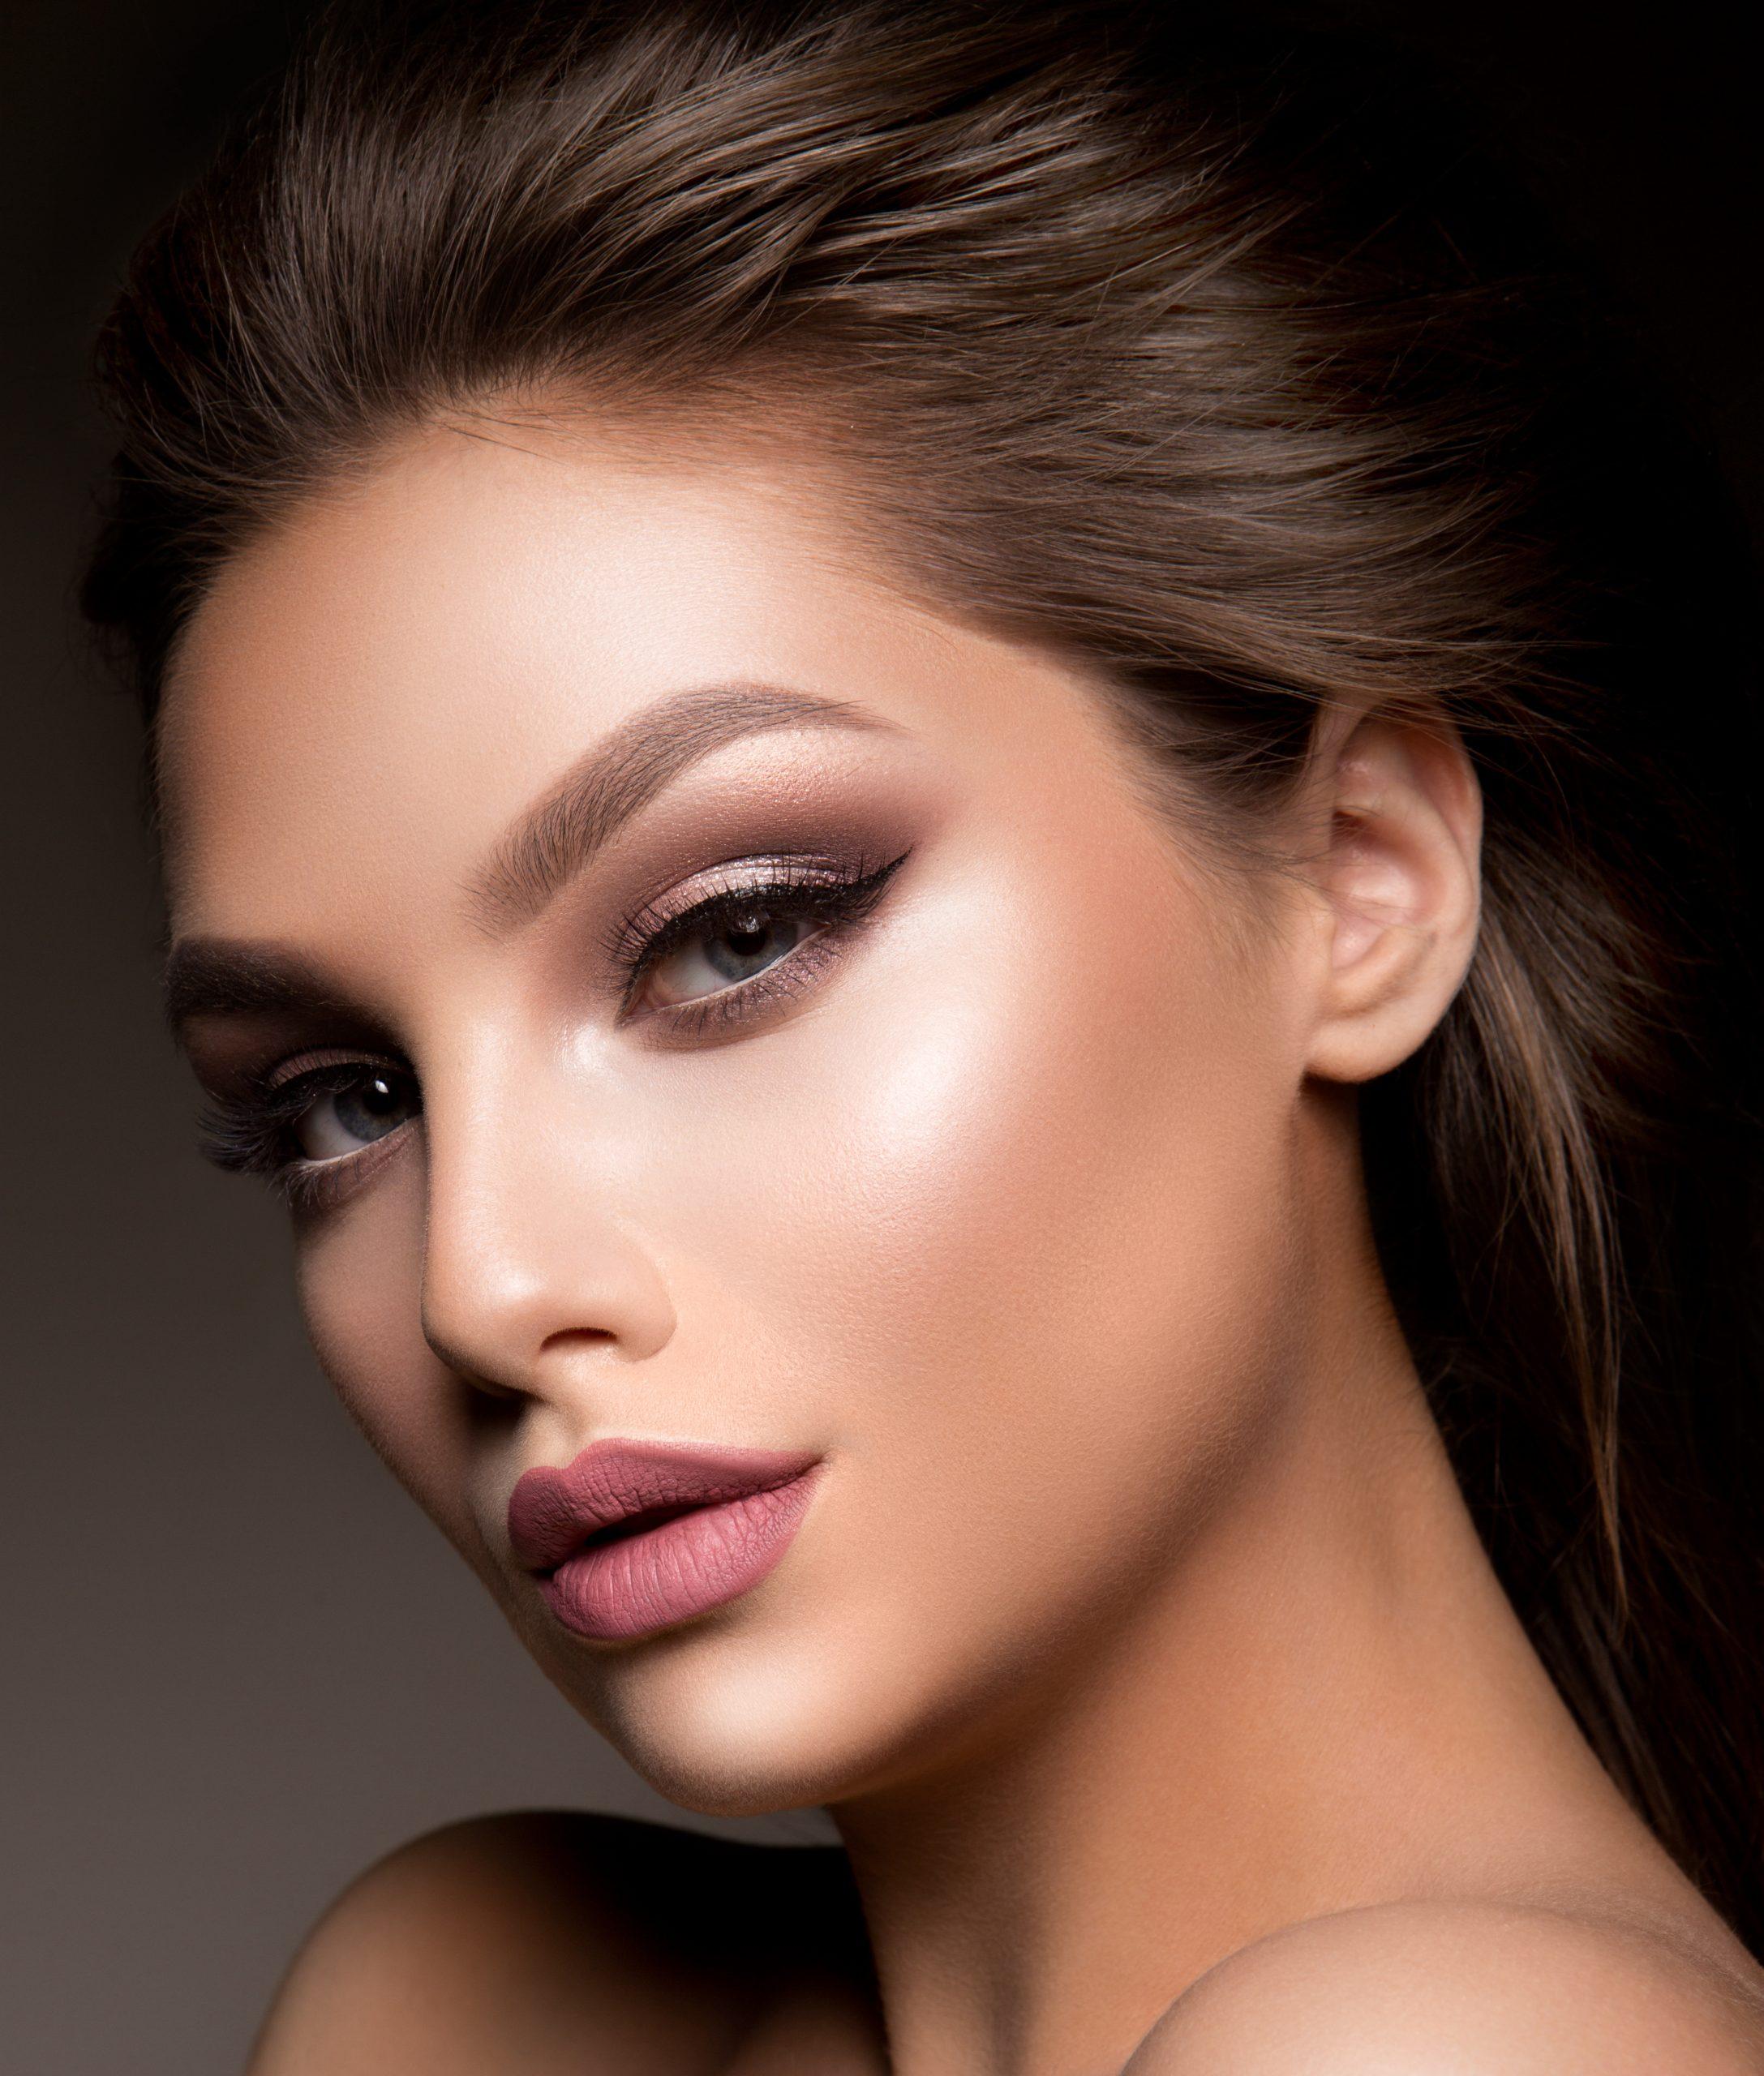 accueil slider rev scaled Dermobeauty Esthétique